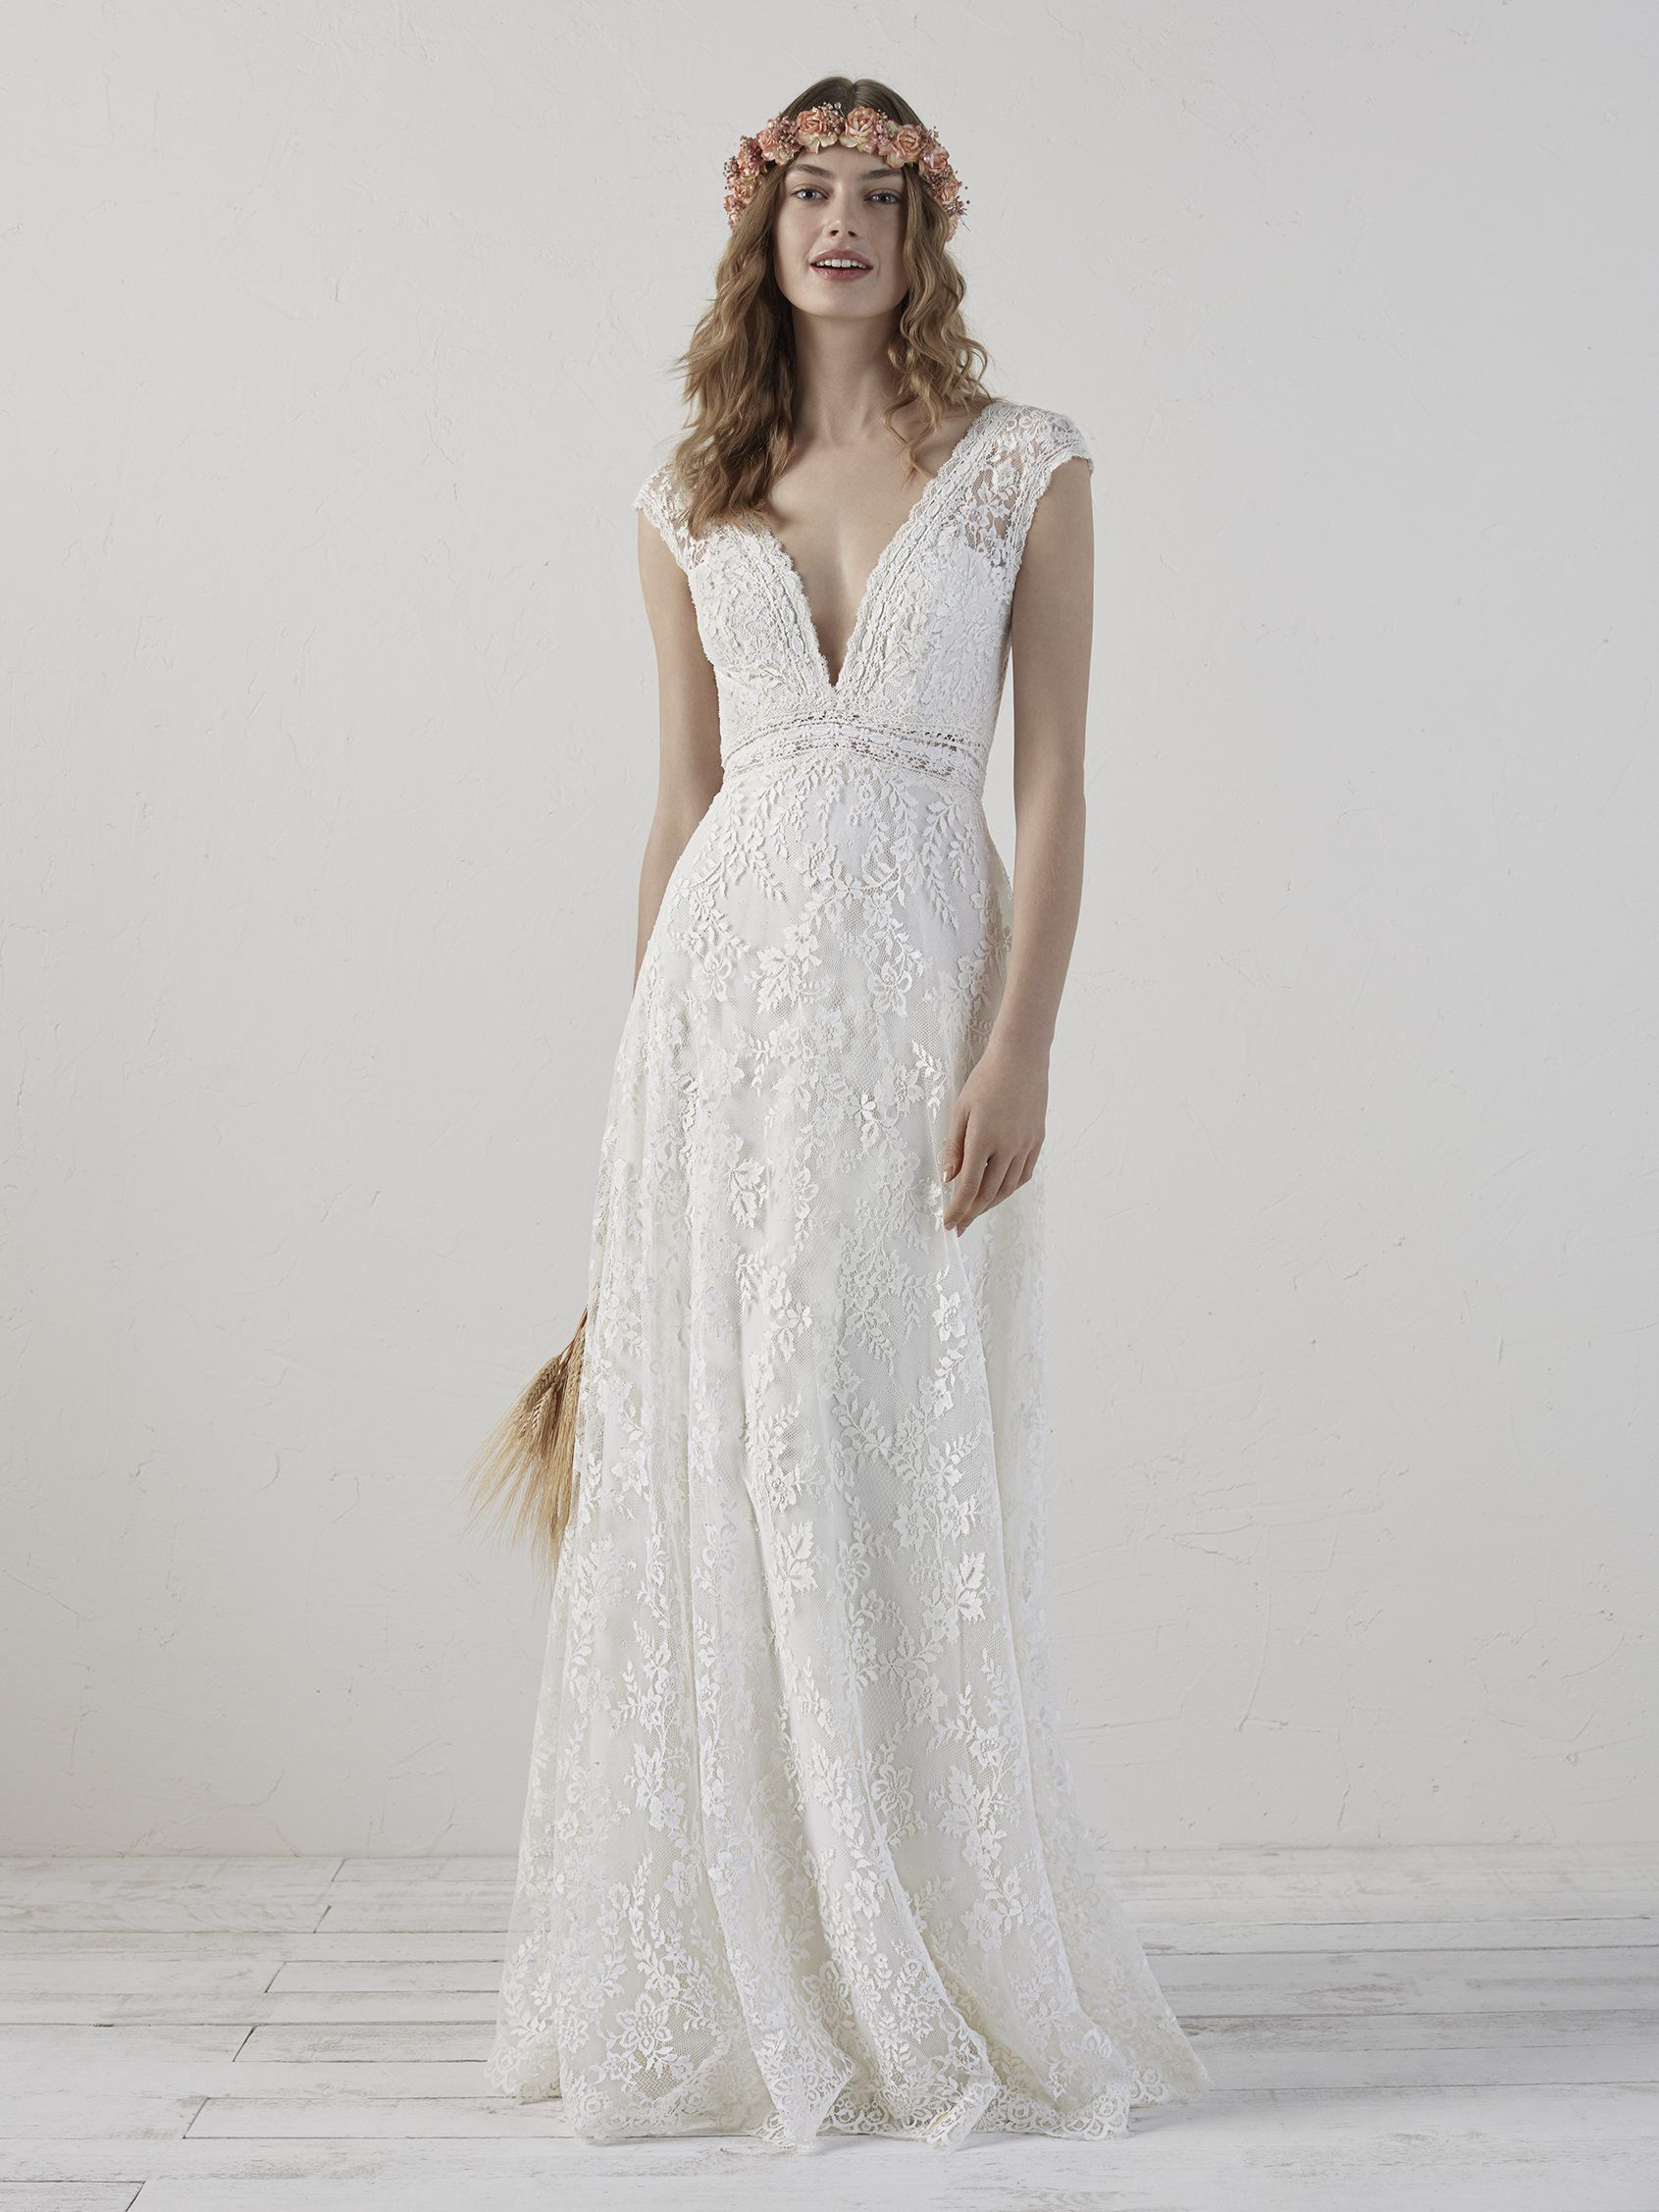 Boho vestido boda – Vestidos populares 2019